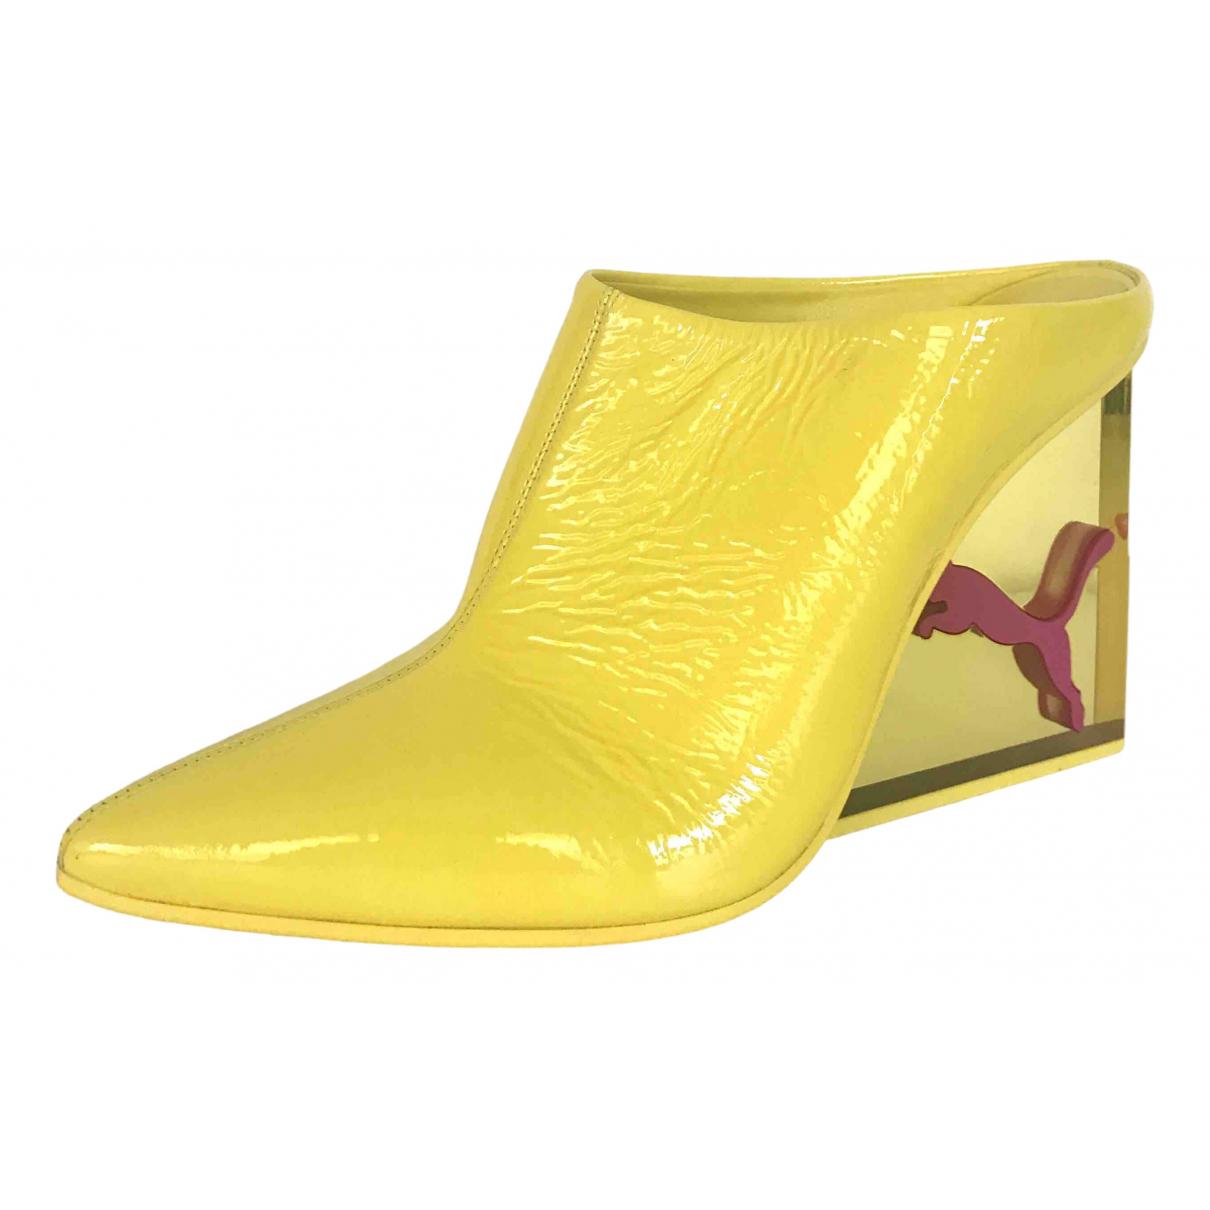 Fenty X Puma \N Yellow Patent leather Heels for Women 39 EU